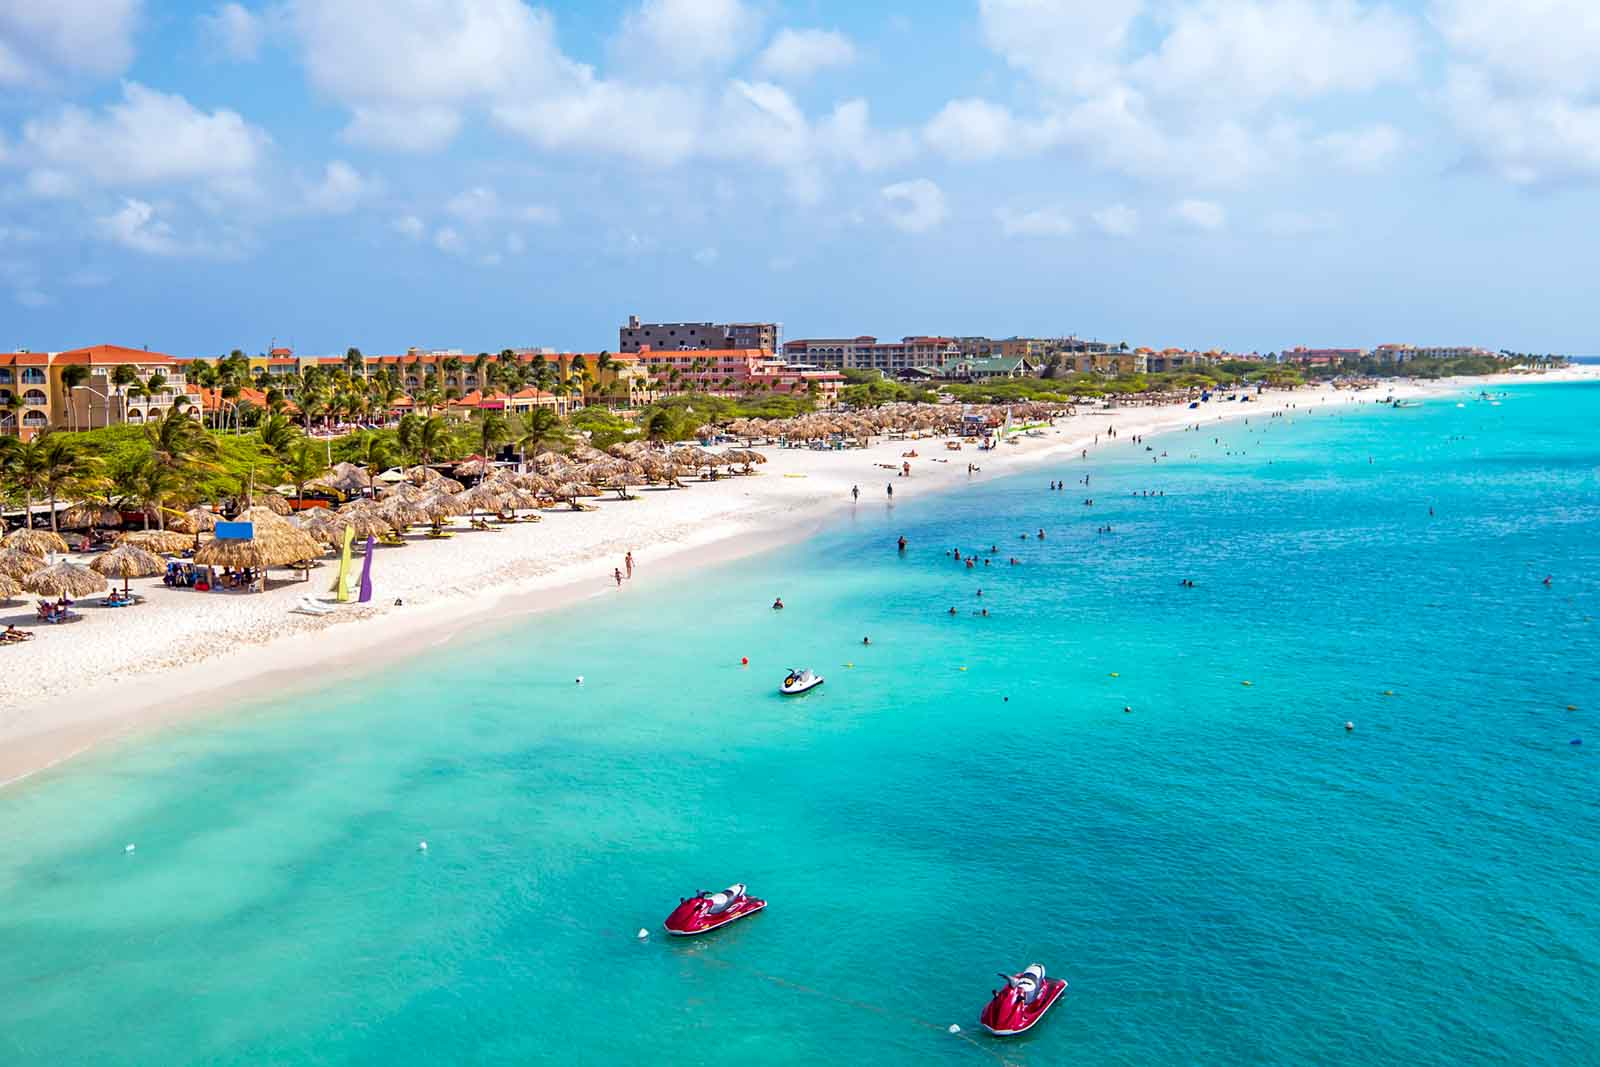 View of white sand Eagle Beach in Aruba